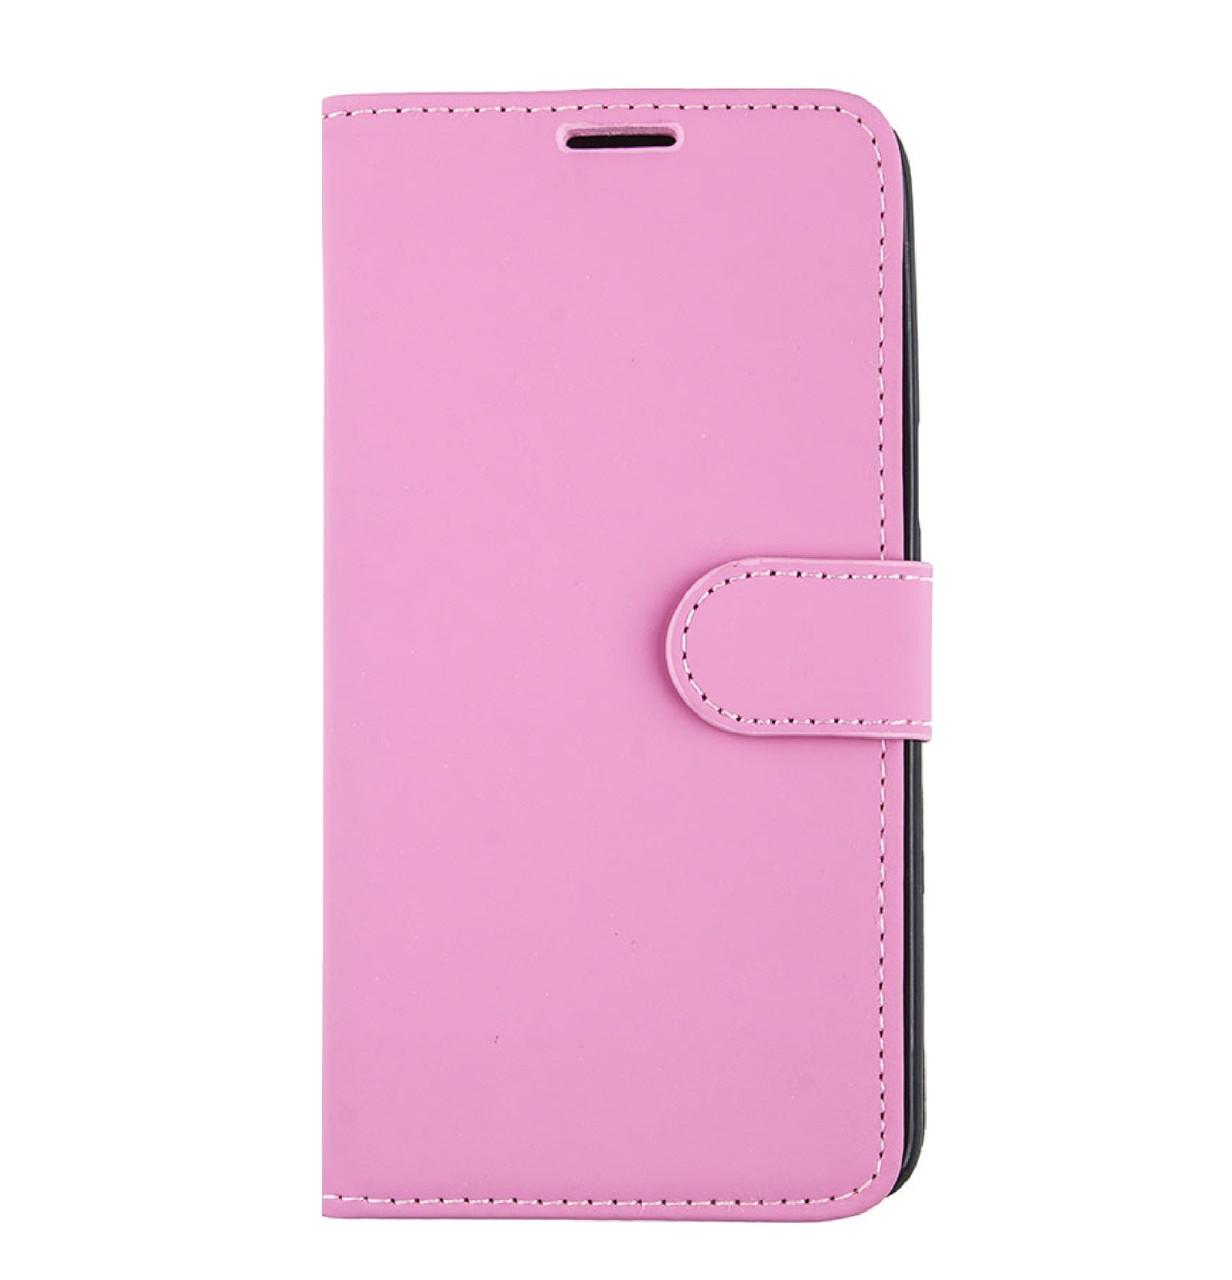 Чехол-книжка TOTO Book Cover Classic на iPhone 7 / 8 Pink